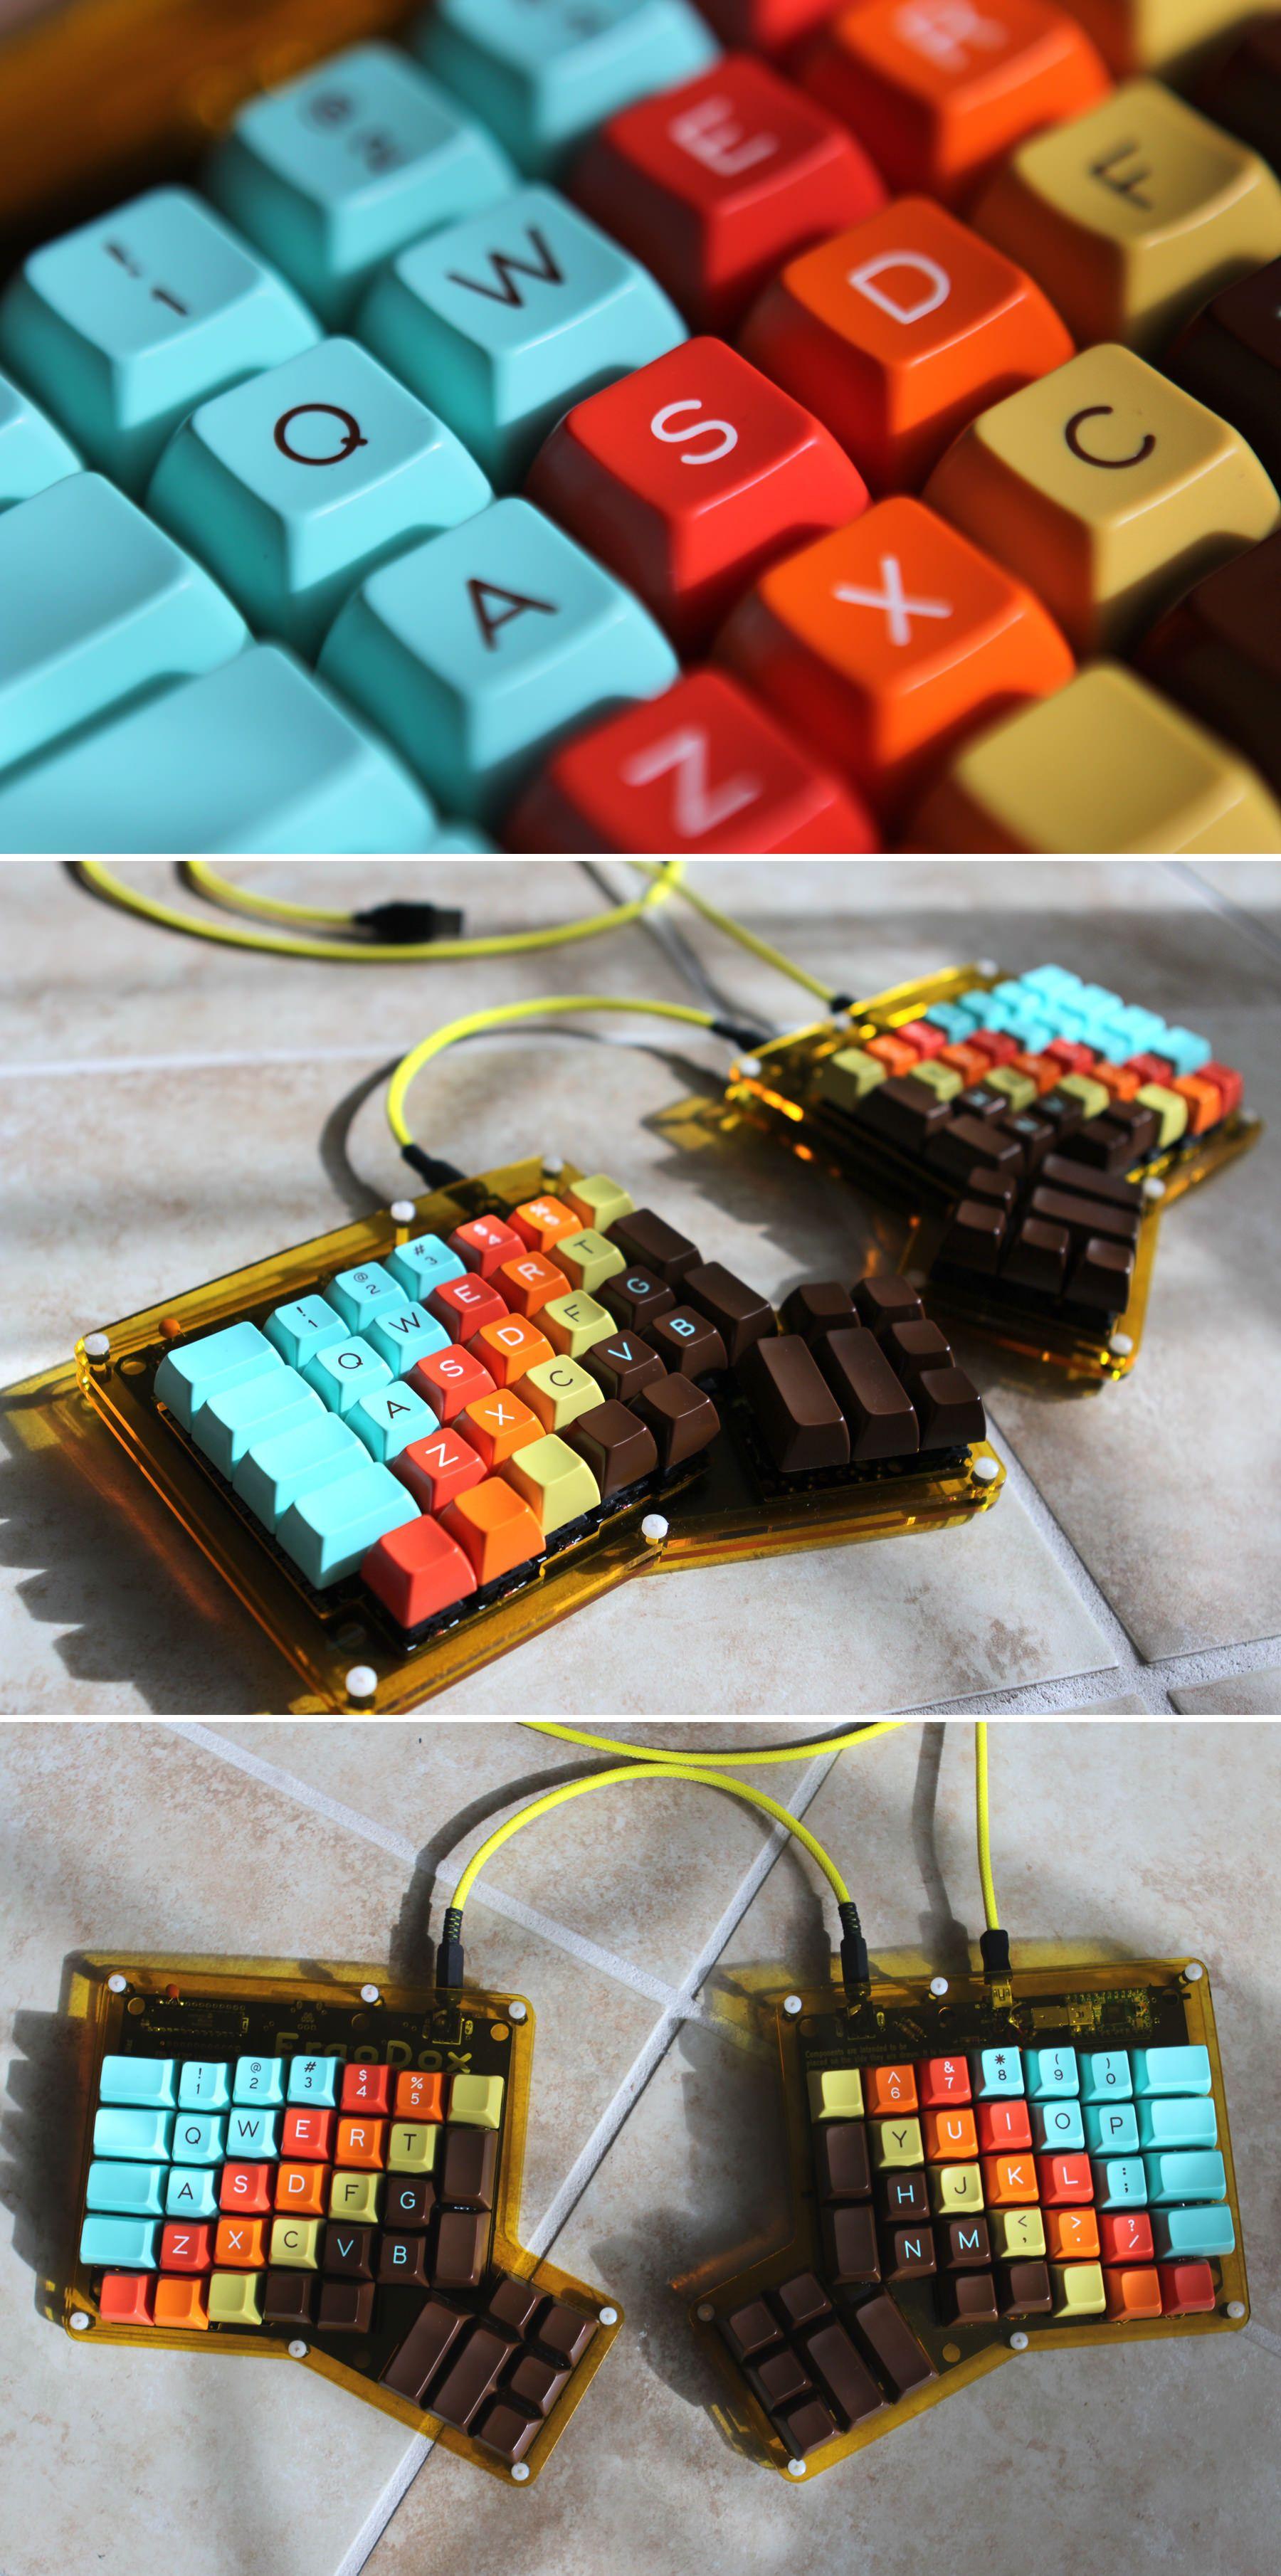 f95615dcc92 Beautiful :: ErgoDox, Acrylic case and 1976 keyset Gadgets And Gizmos,  Technology,